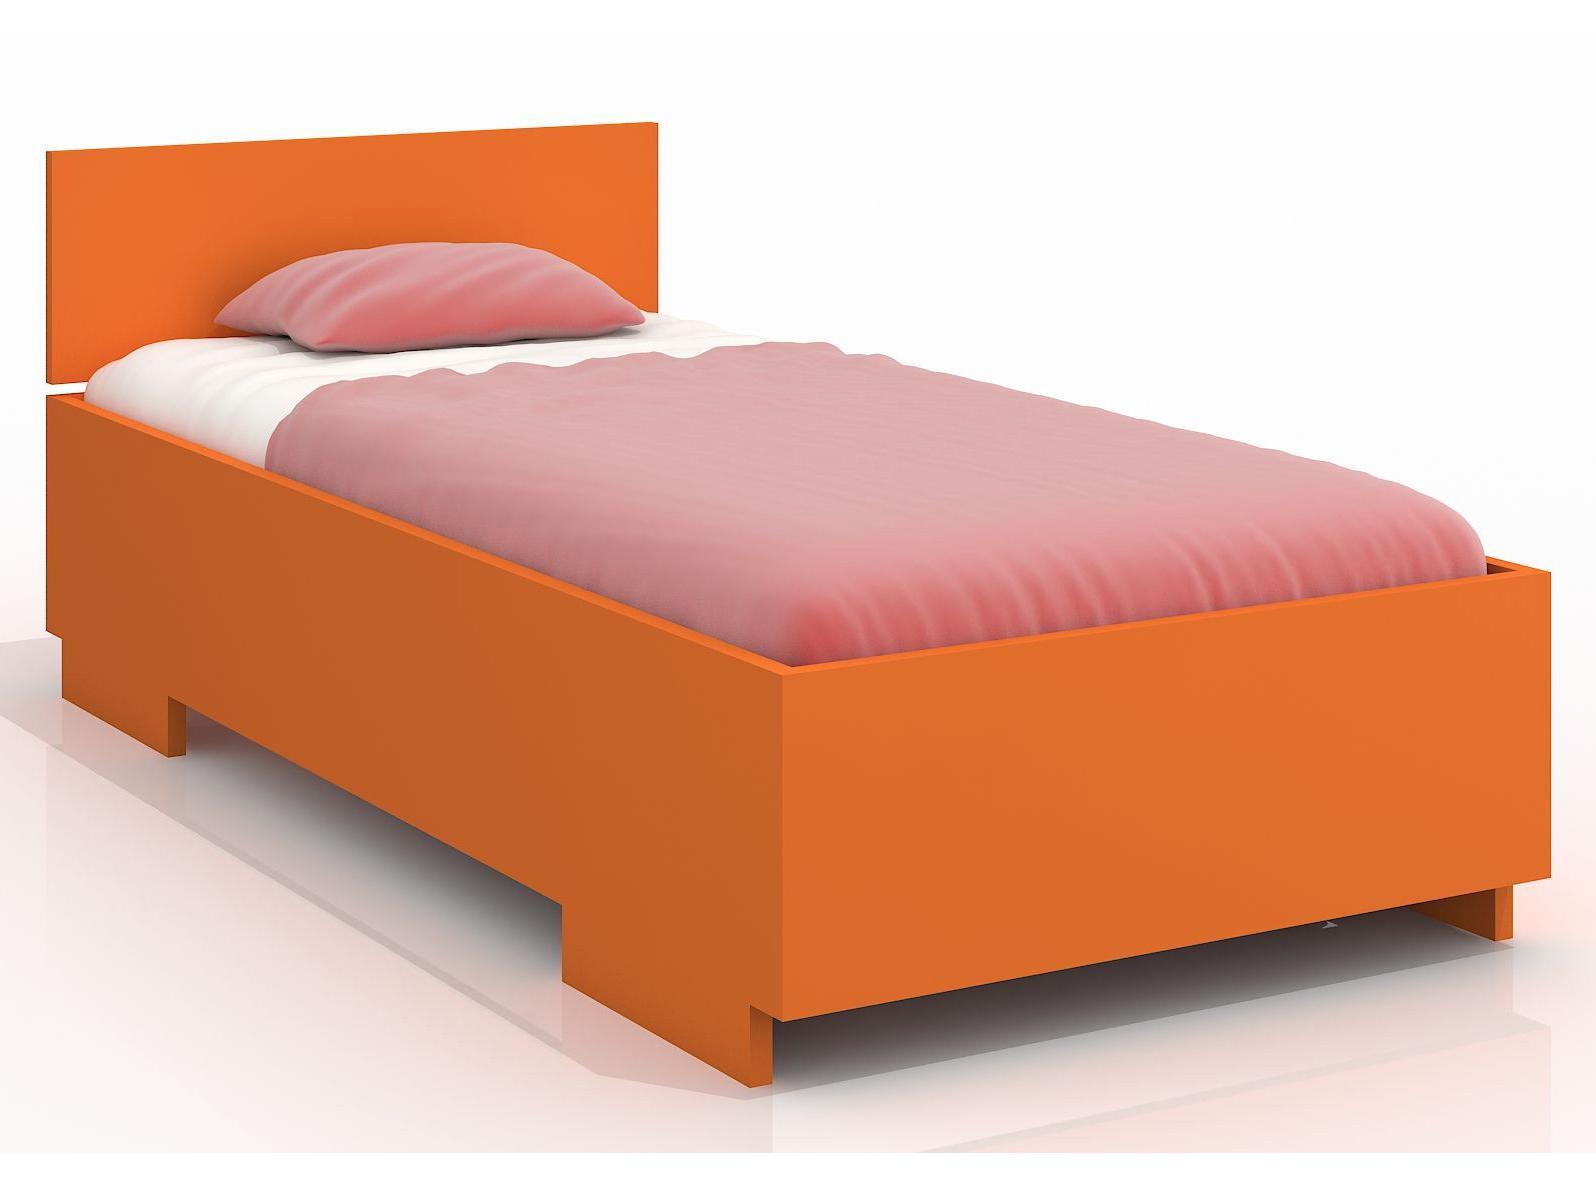 Jednolůžková postel 120 cm - Naturlig Kids - Larsos High (borovice) (s roštem)